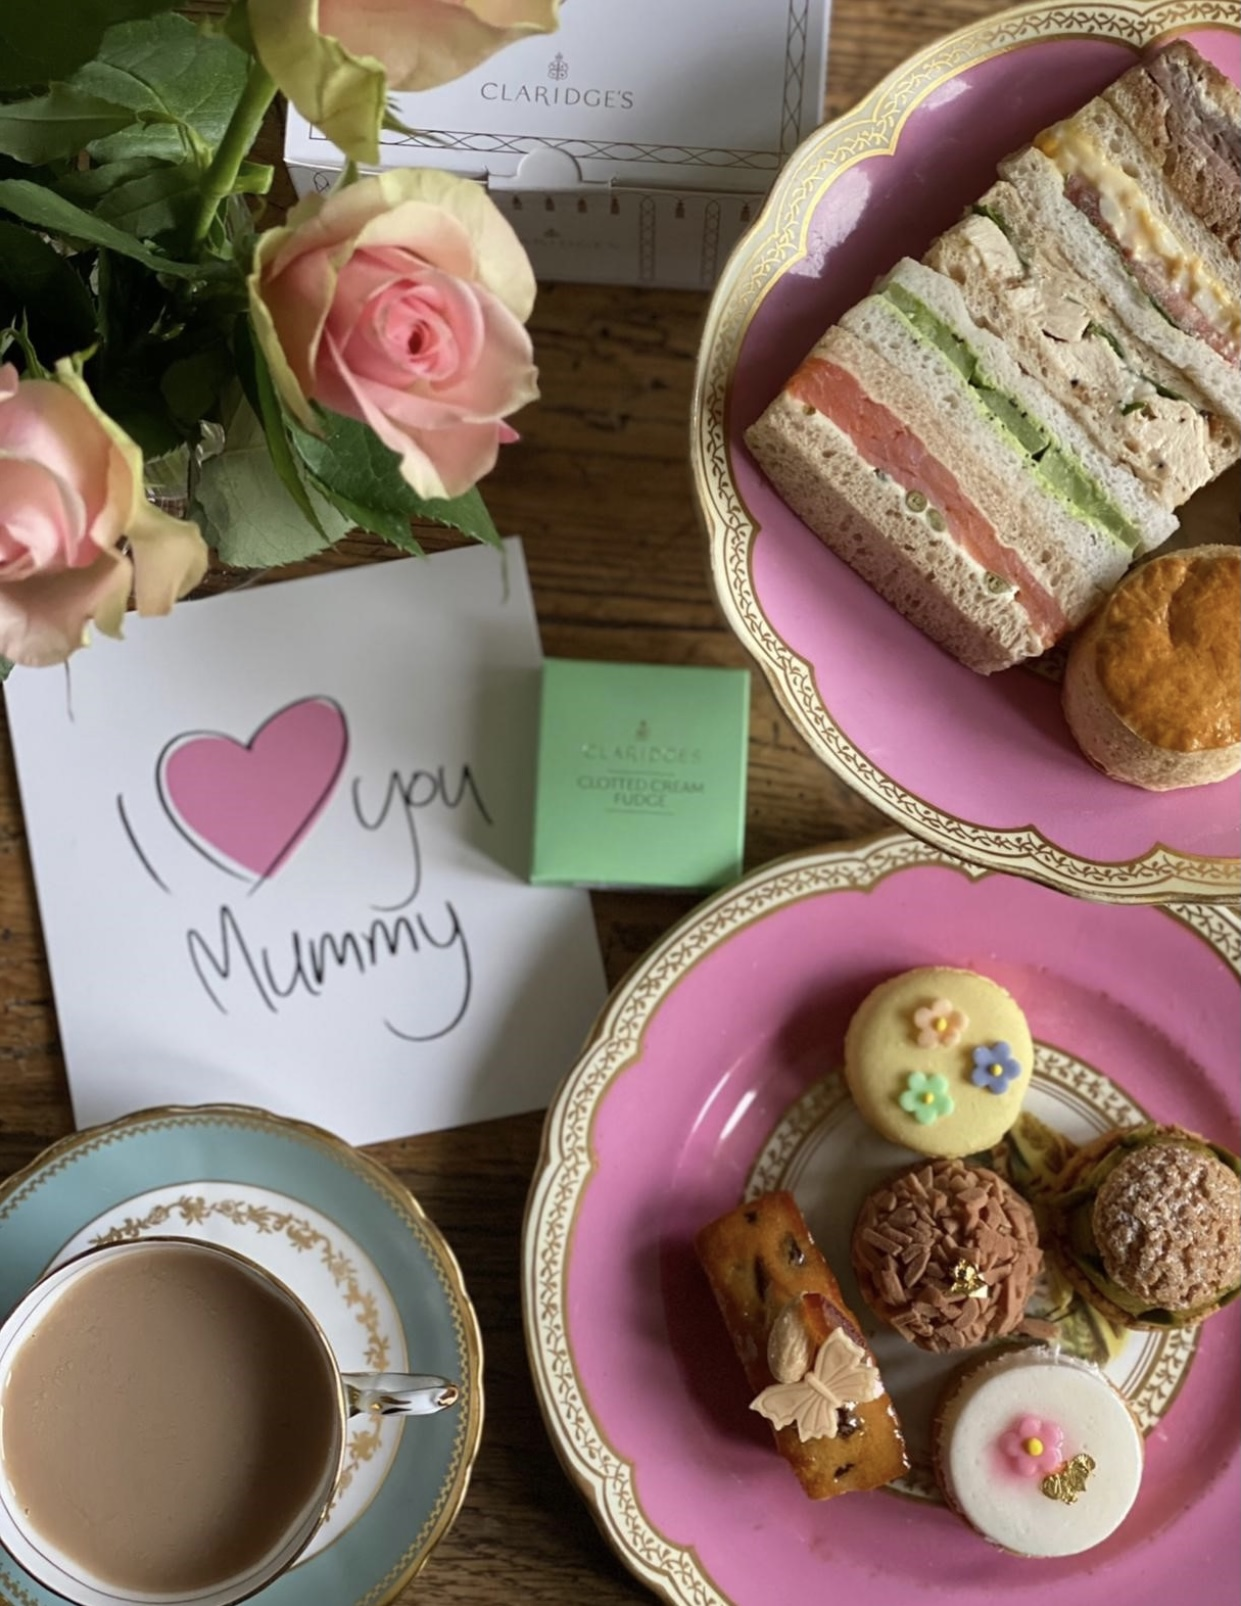 claridge's london afternoon tea take away mother's day - East End Taste Magazine